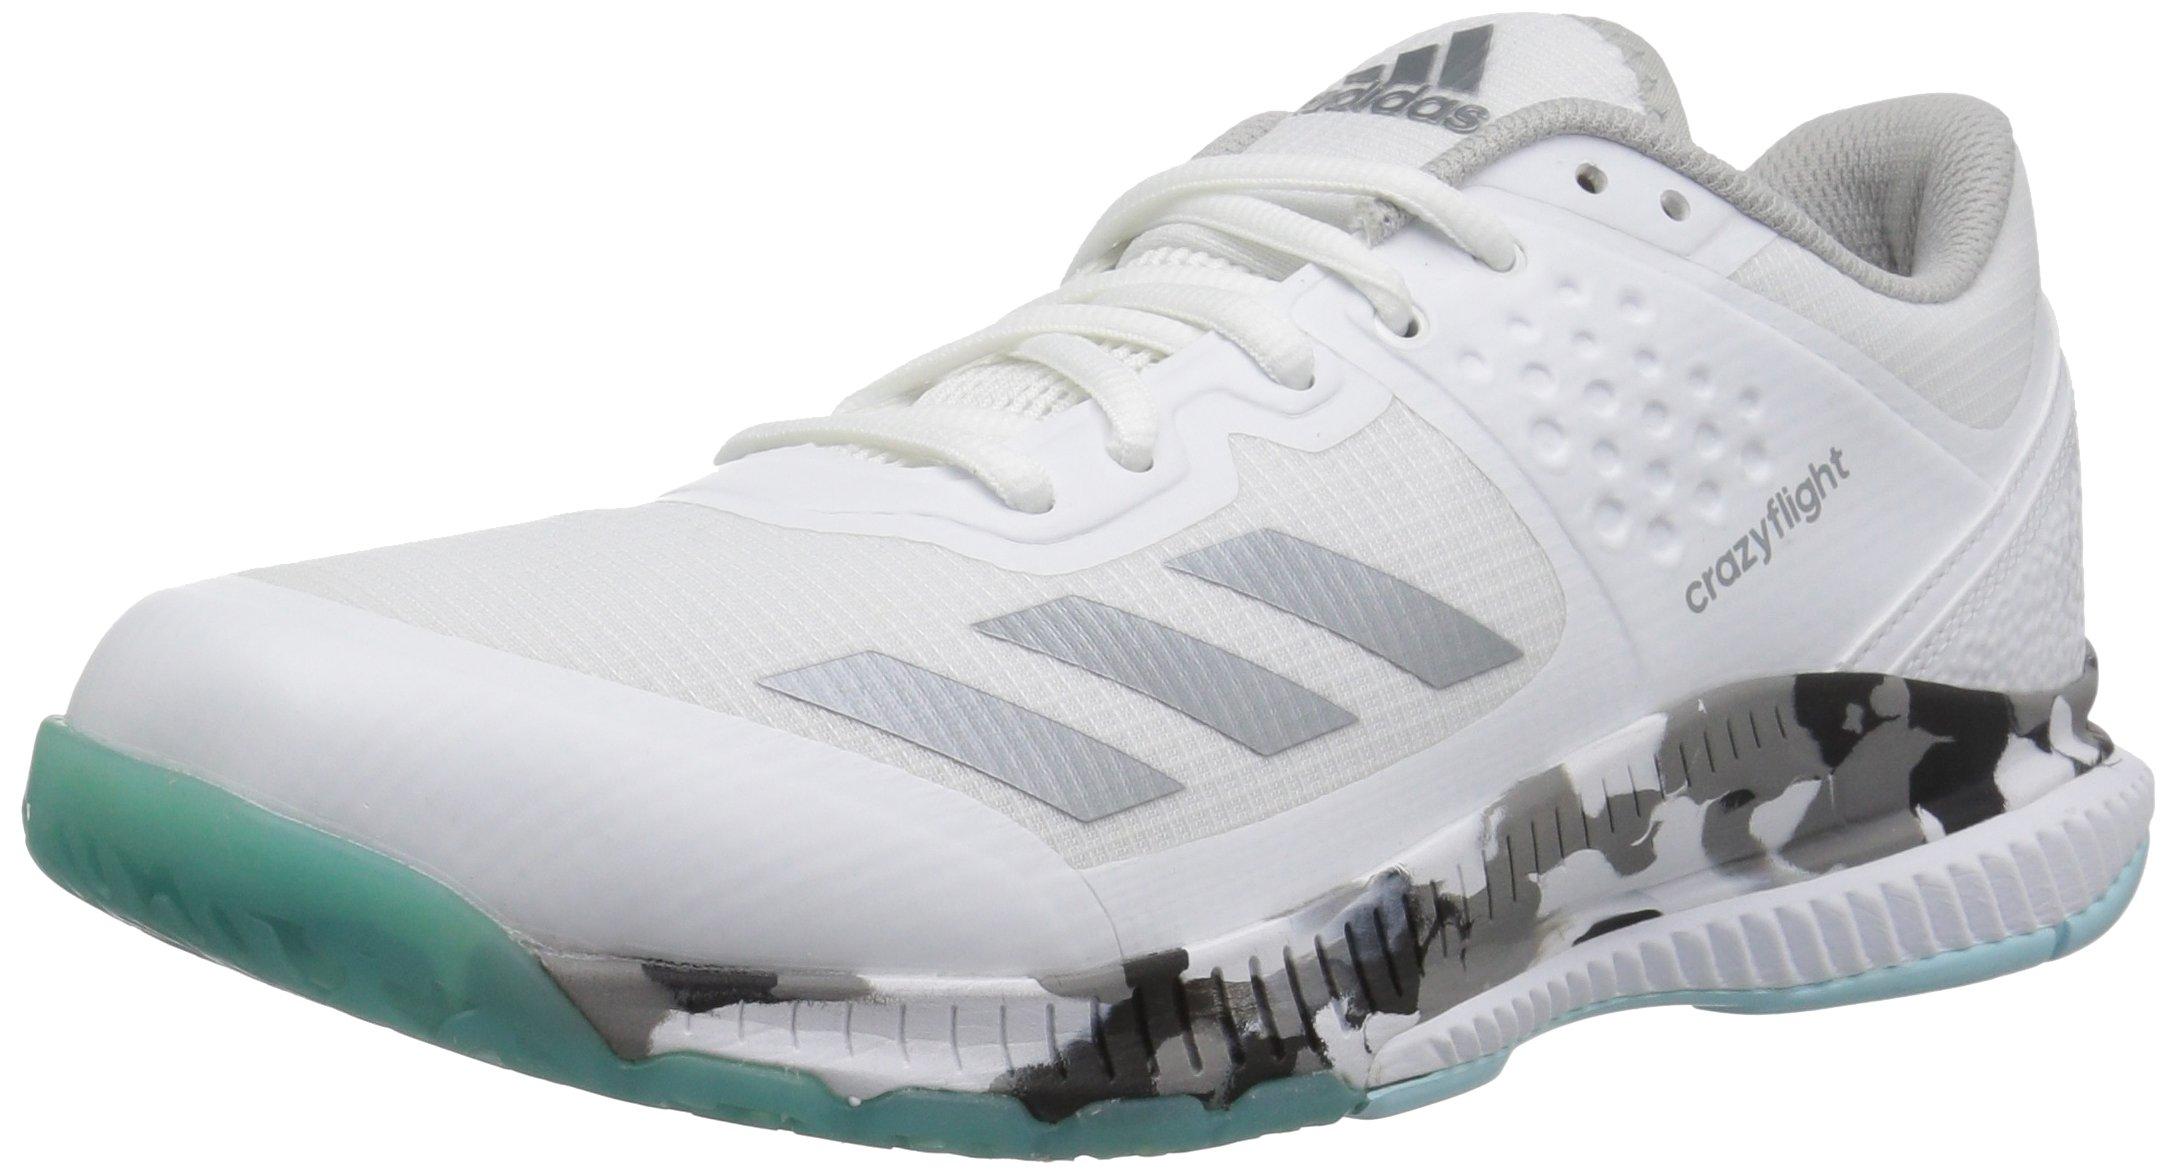 adidas Performance Women's Crazyflight Bounce W Volleyball Shoe, White/Night Metallic/Grey Two, 14 Medium US